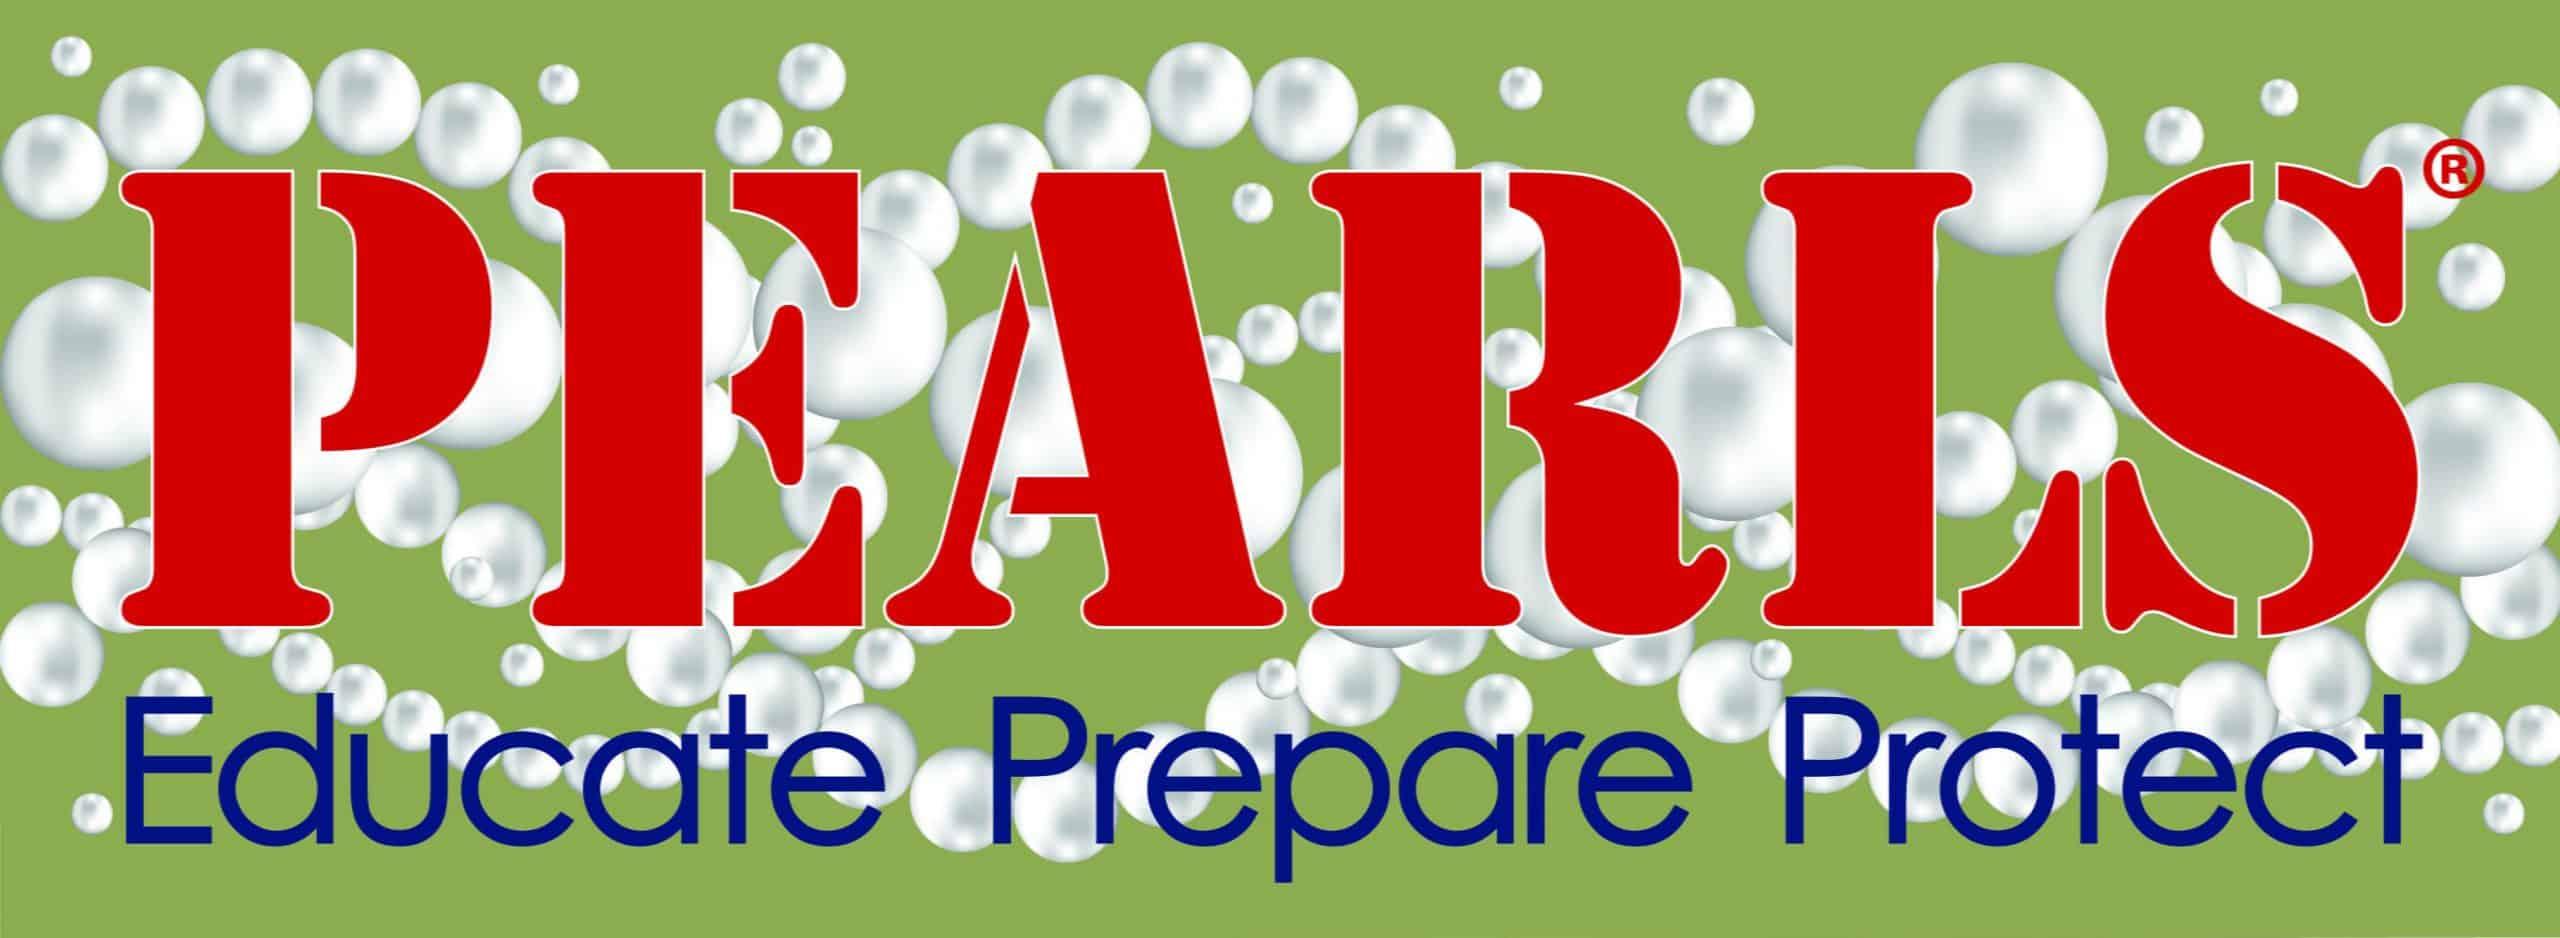 PEALRS Prepared